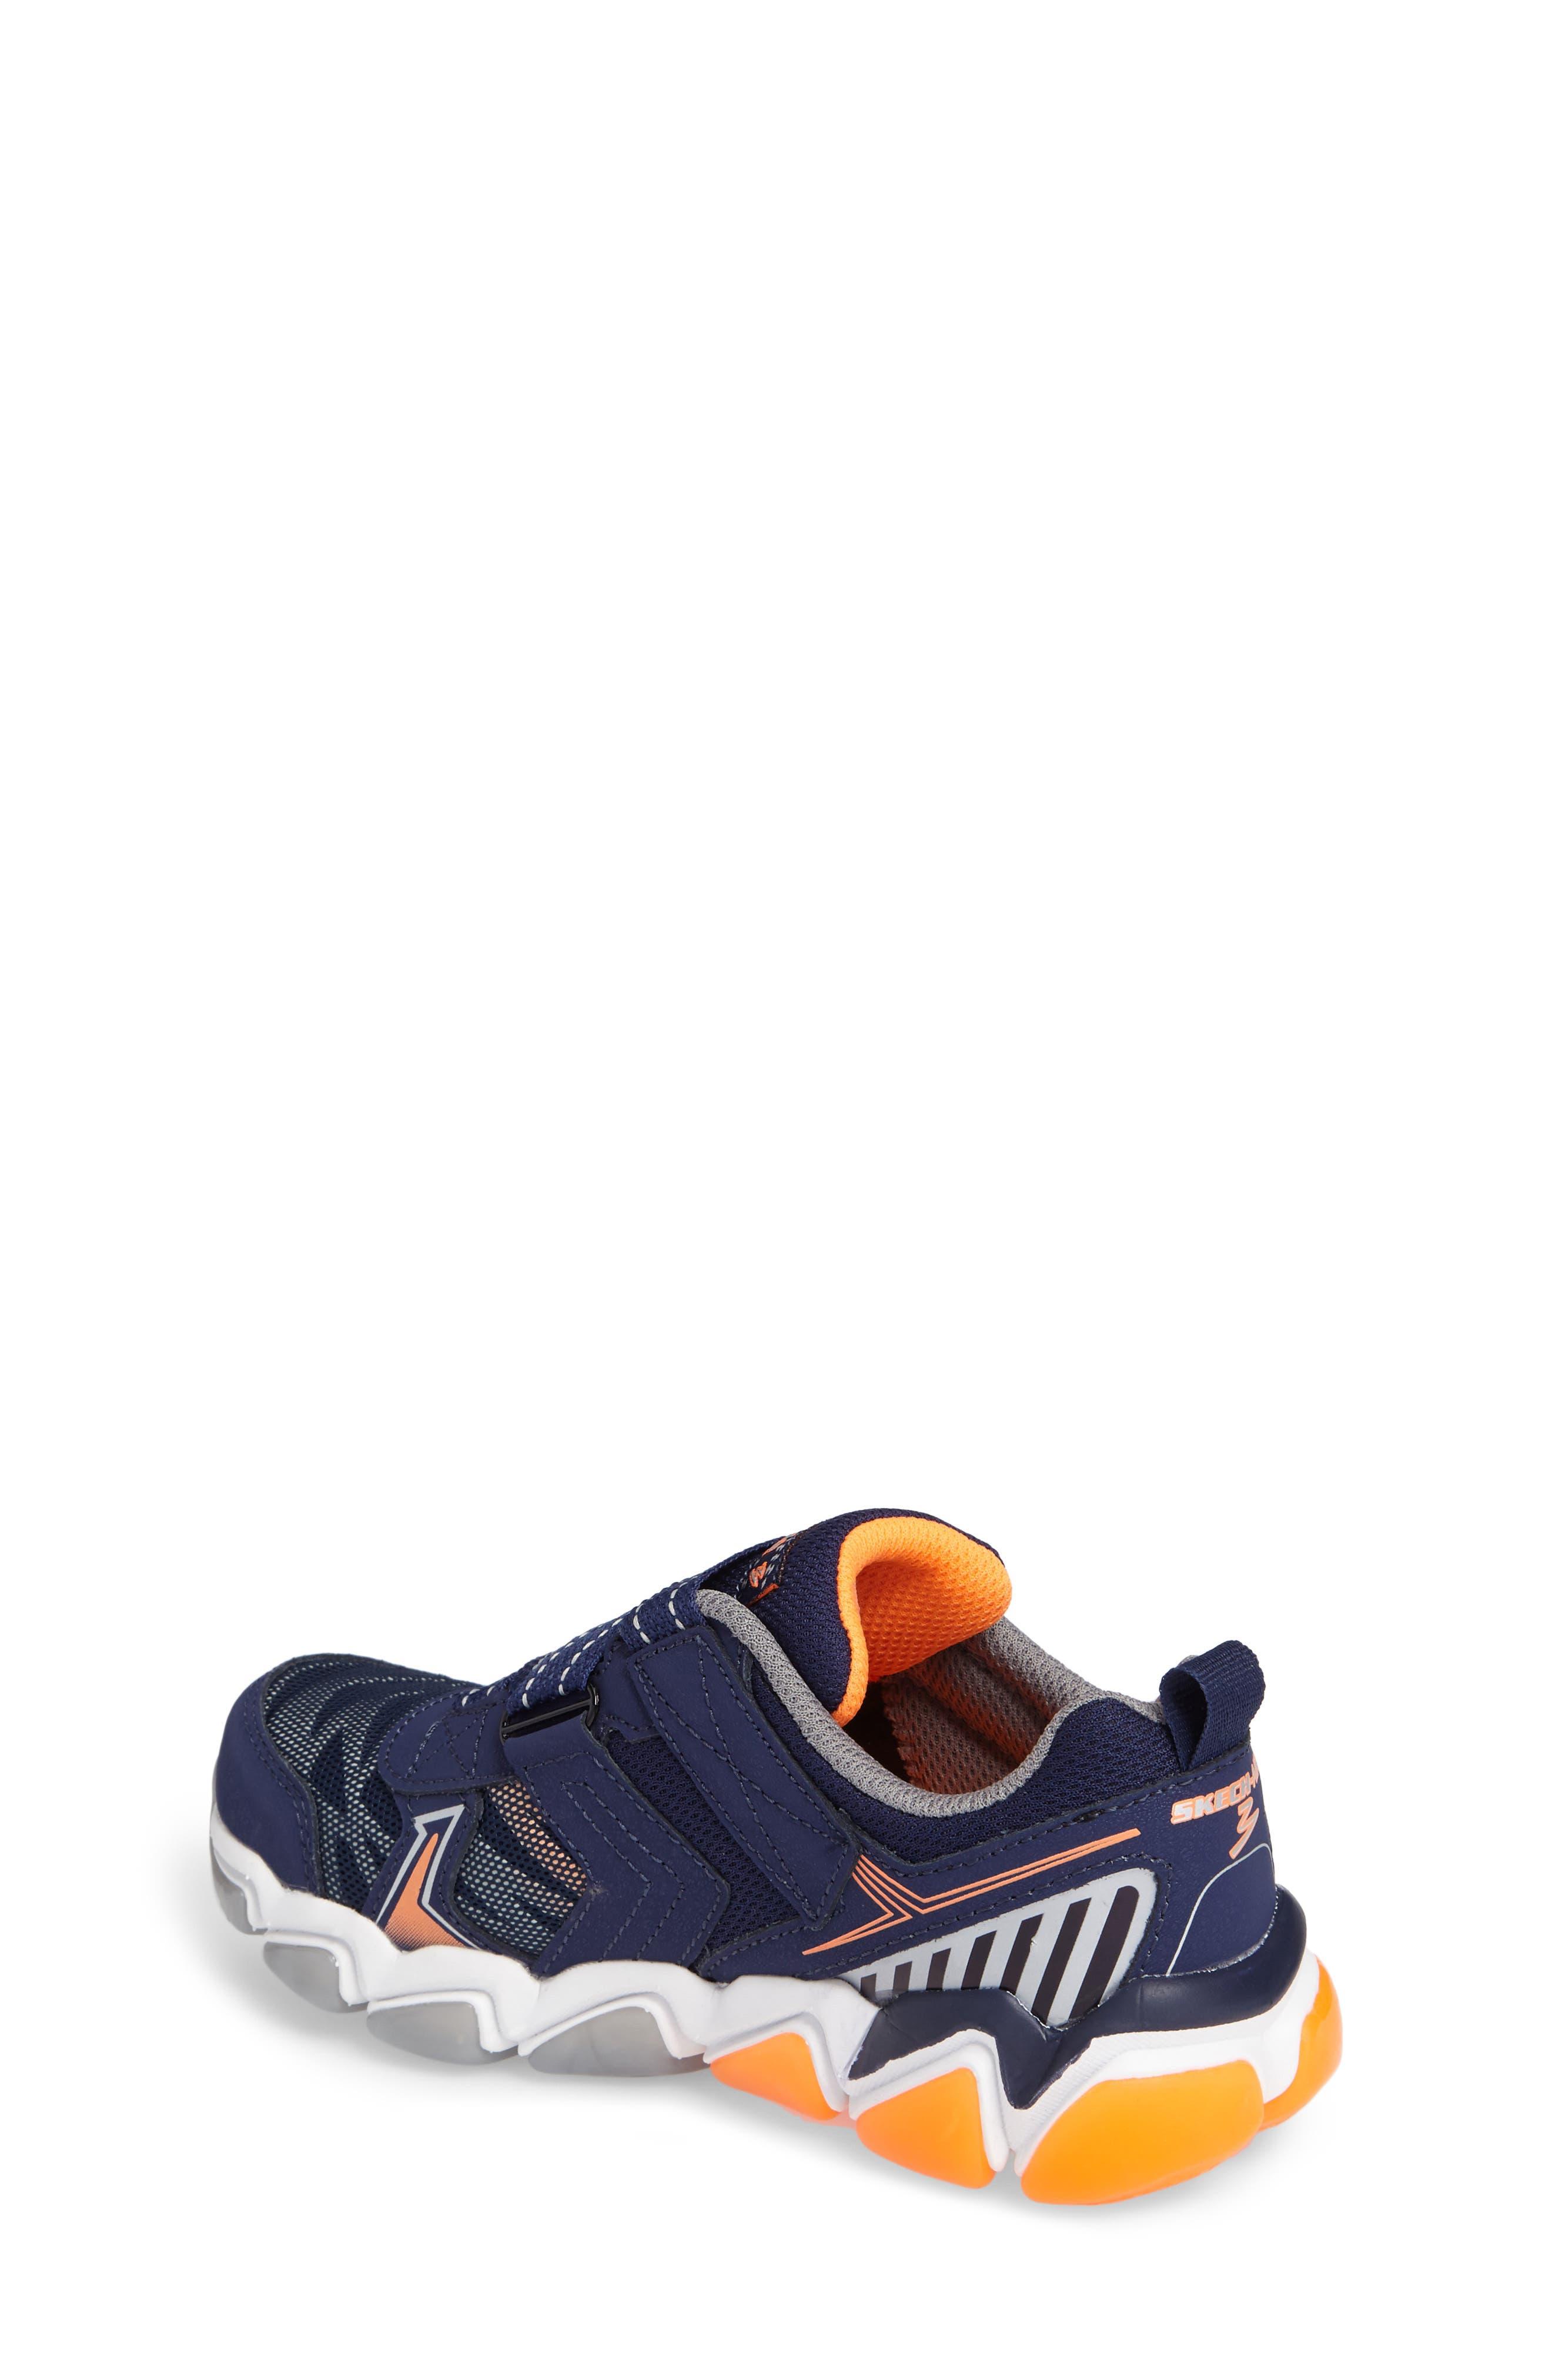 Skech-Air 3.0 Downswitch Sneaker,                             Alternate thumbnail 2, color,                             Navy/ Orange